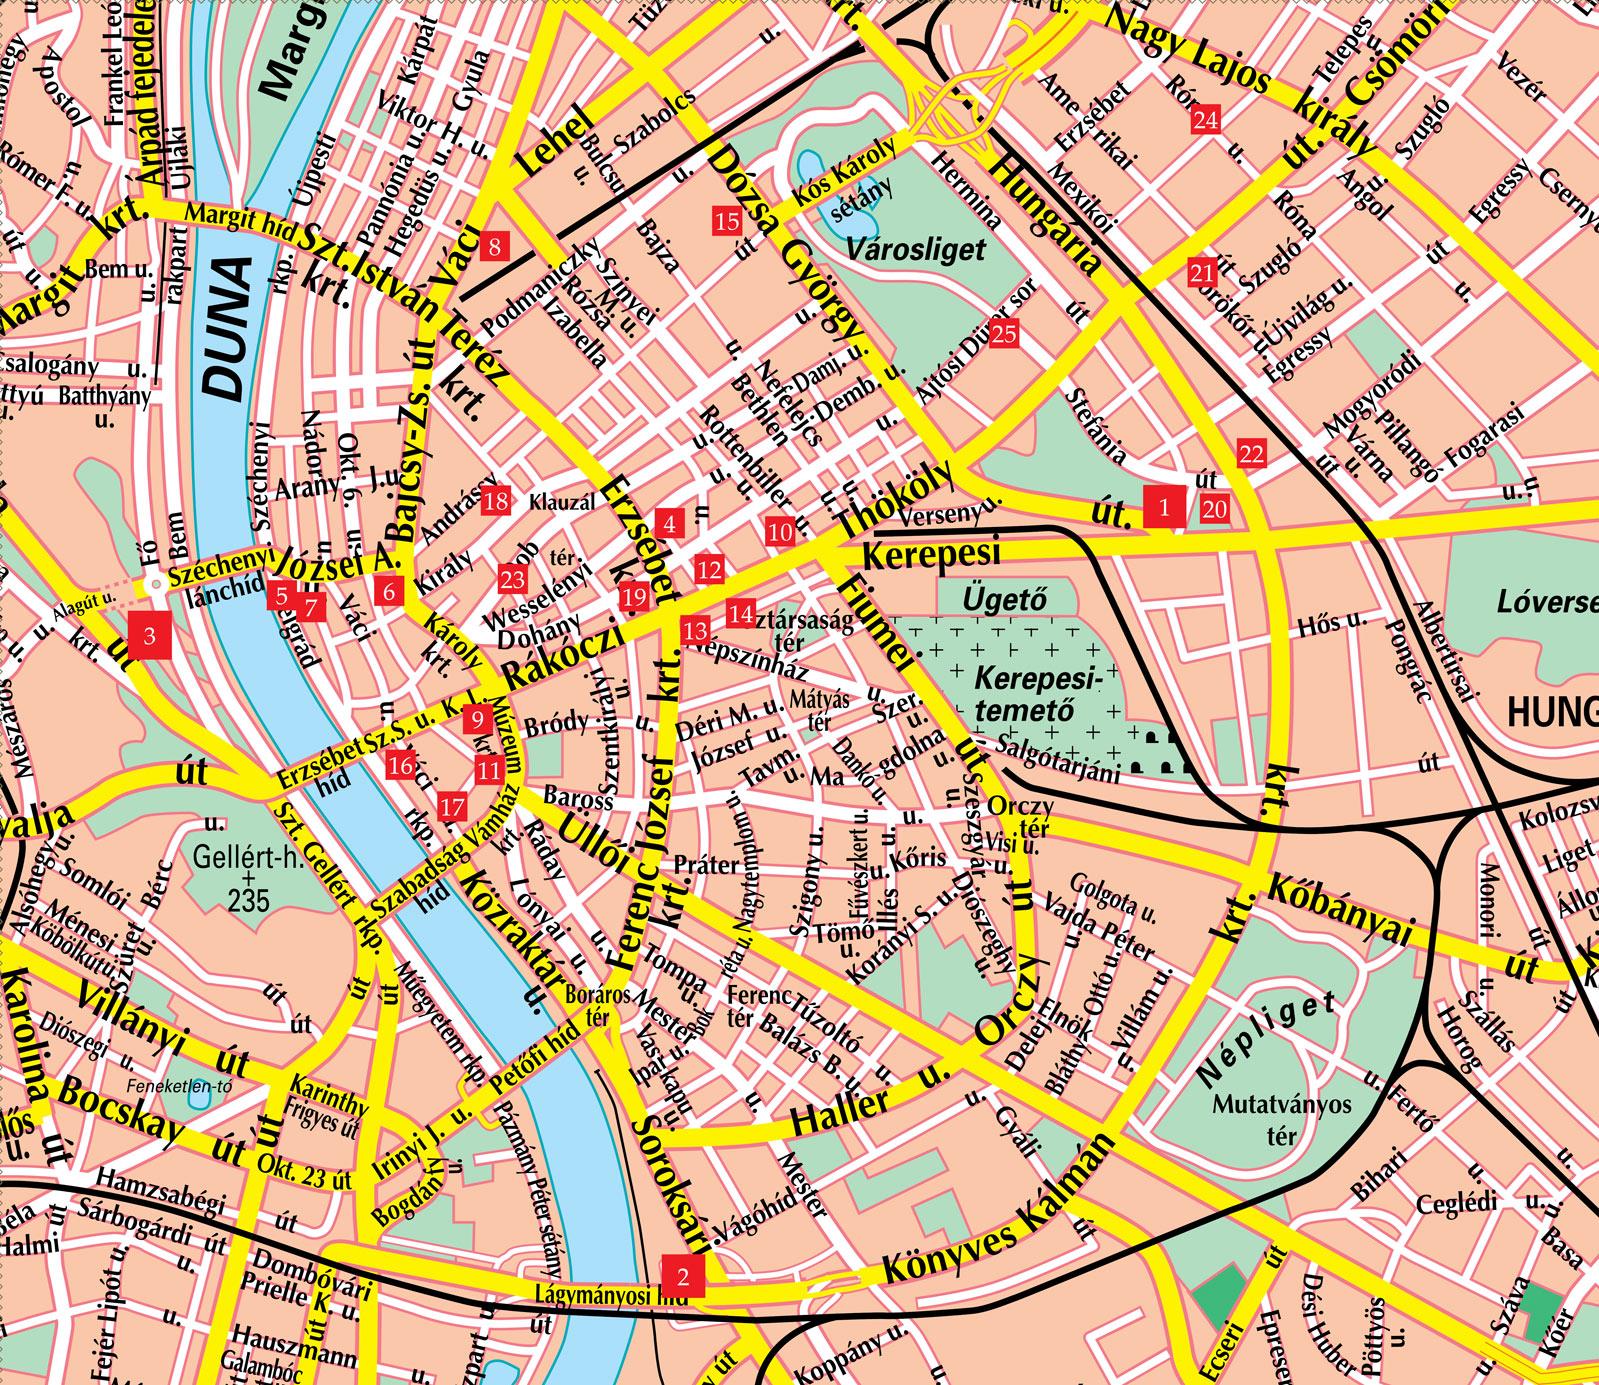 Budapest Street Map - Budapest Hungary • mappery